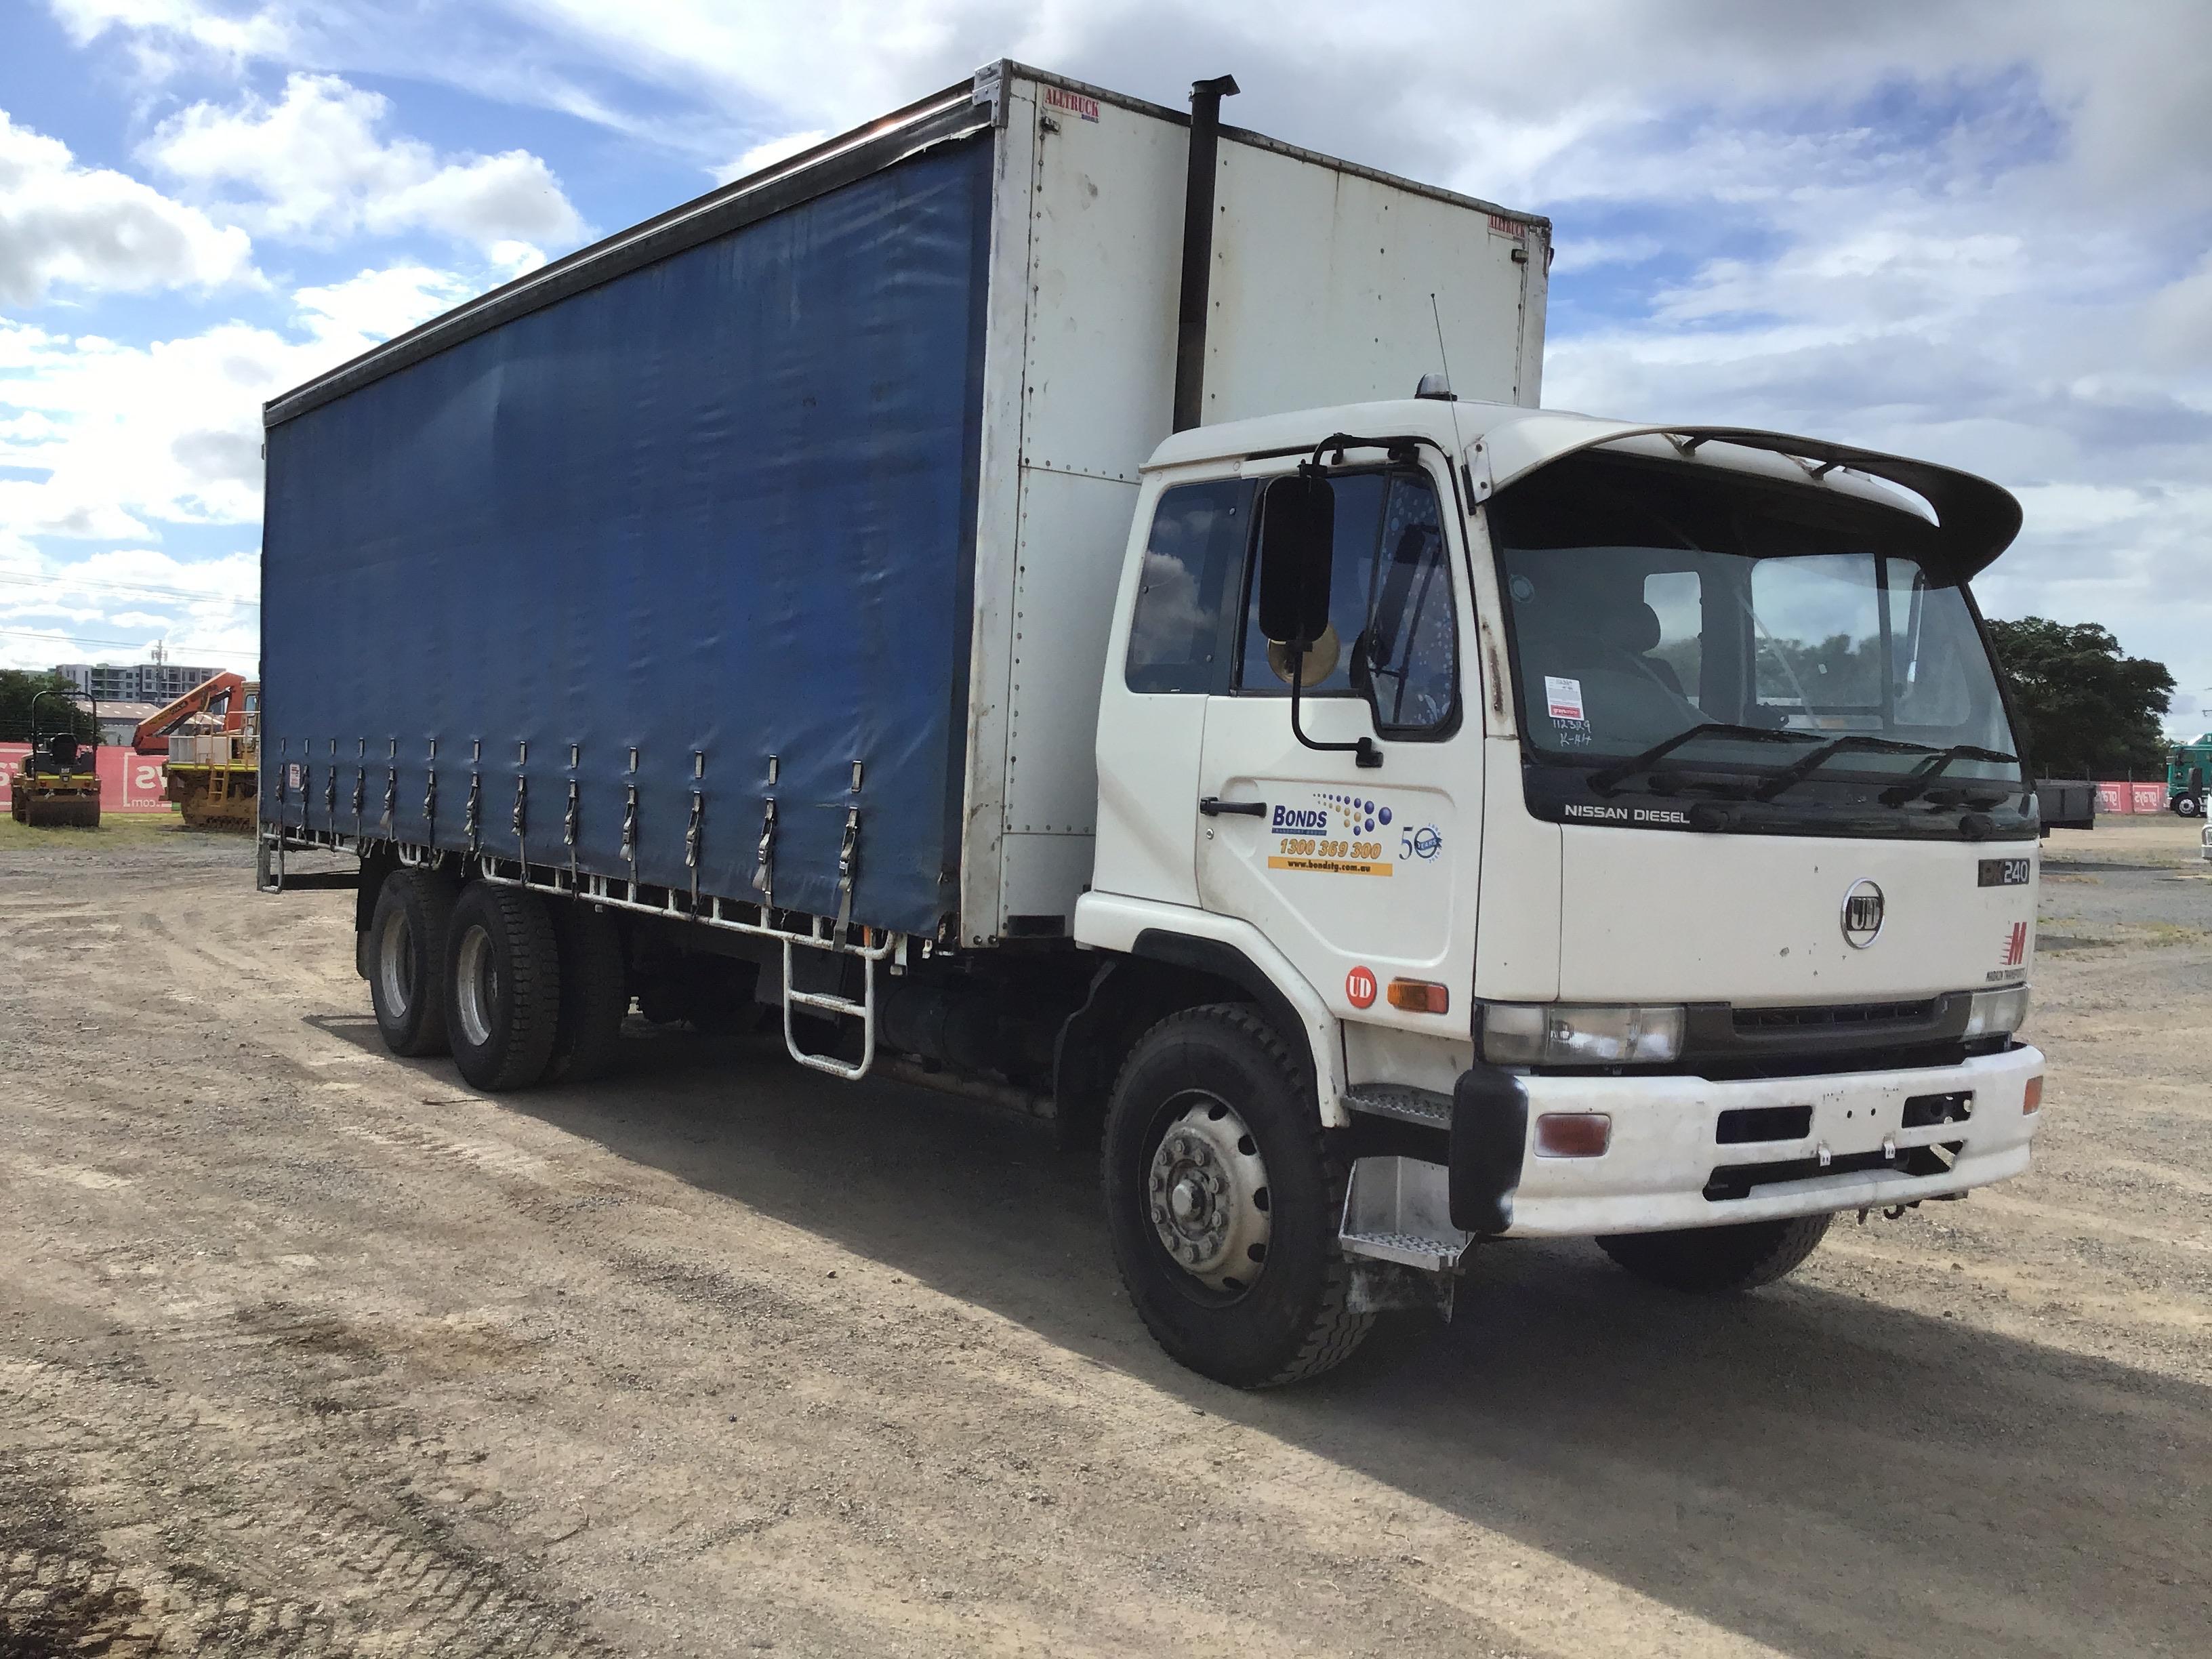 1996 UD Nissan Diesel PK 310 6 x 2 Curtainsider Rigid Truck